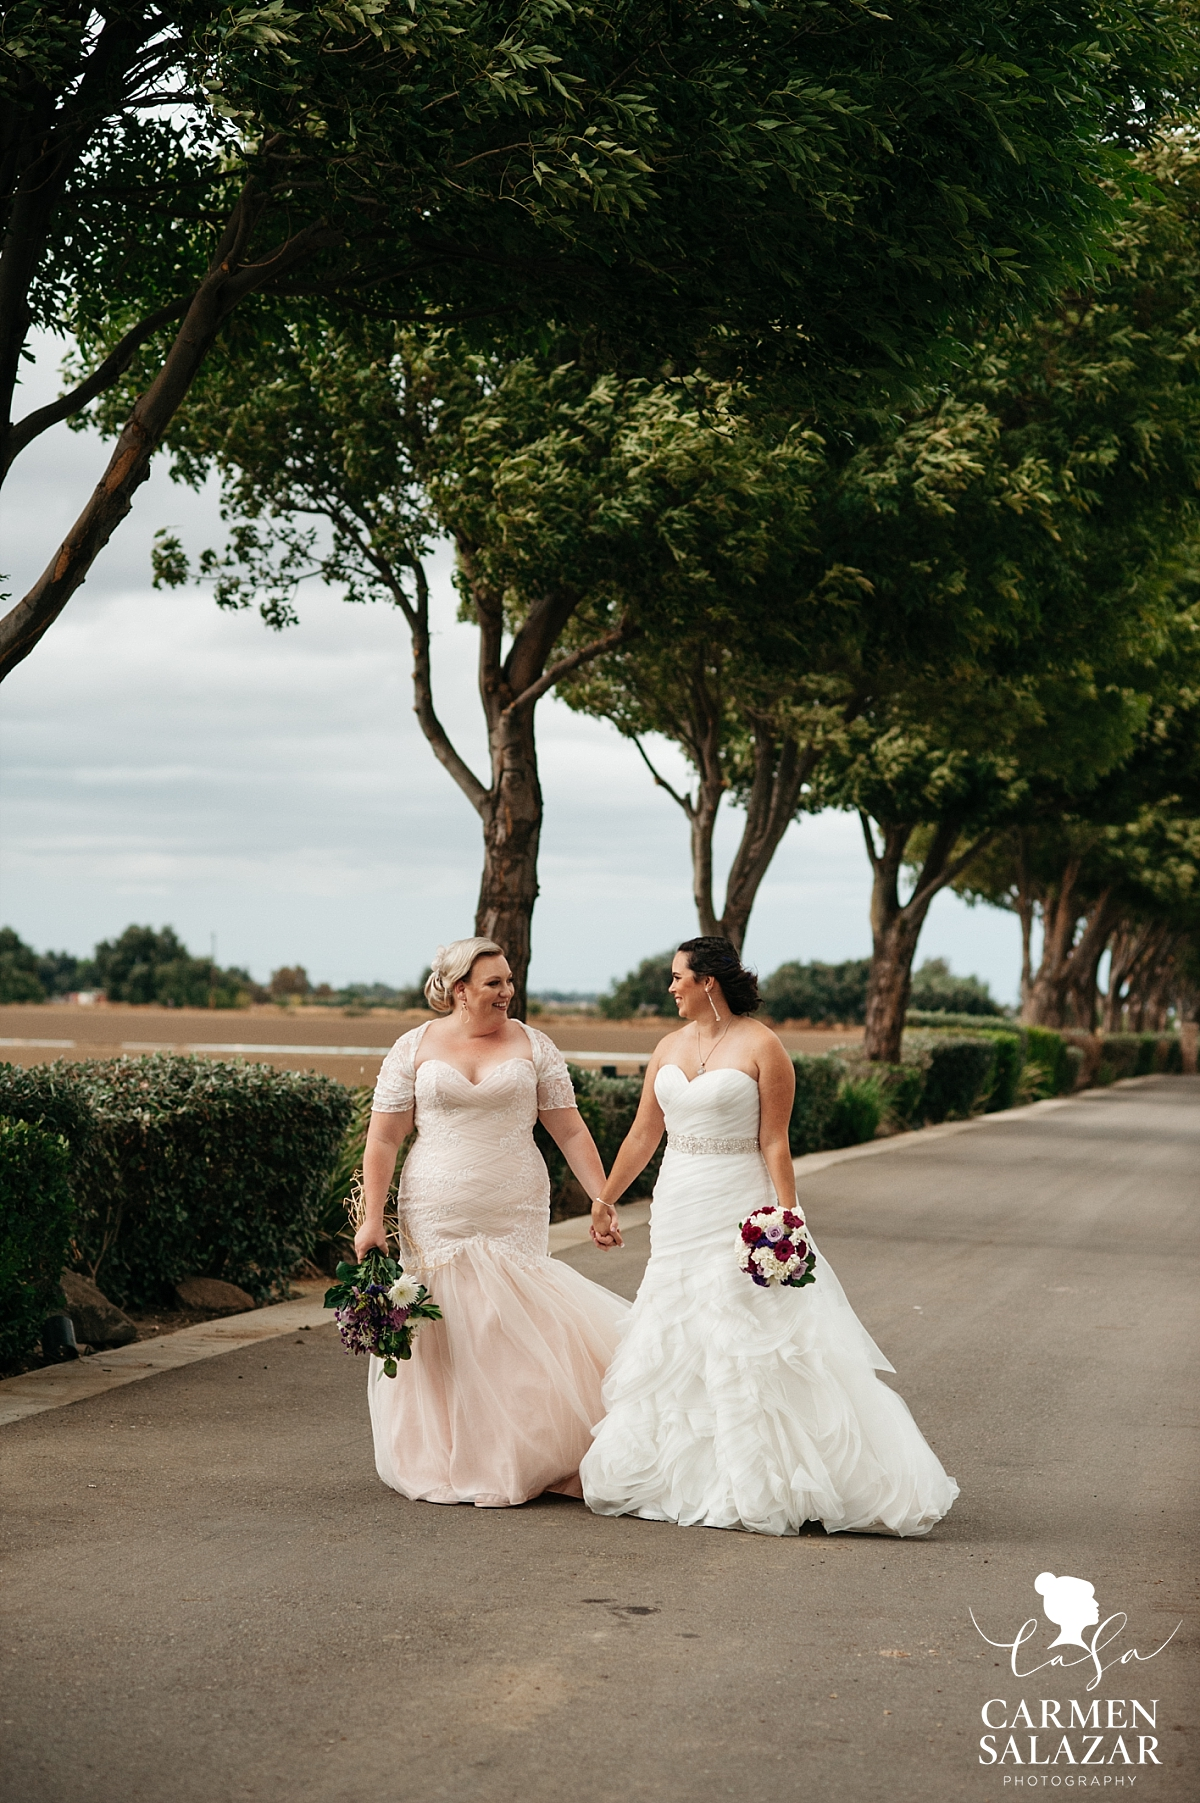 Same-sex bridal portraits at California winery - Carmen Salazar